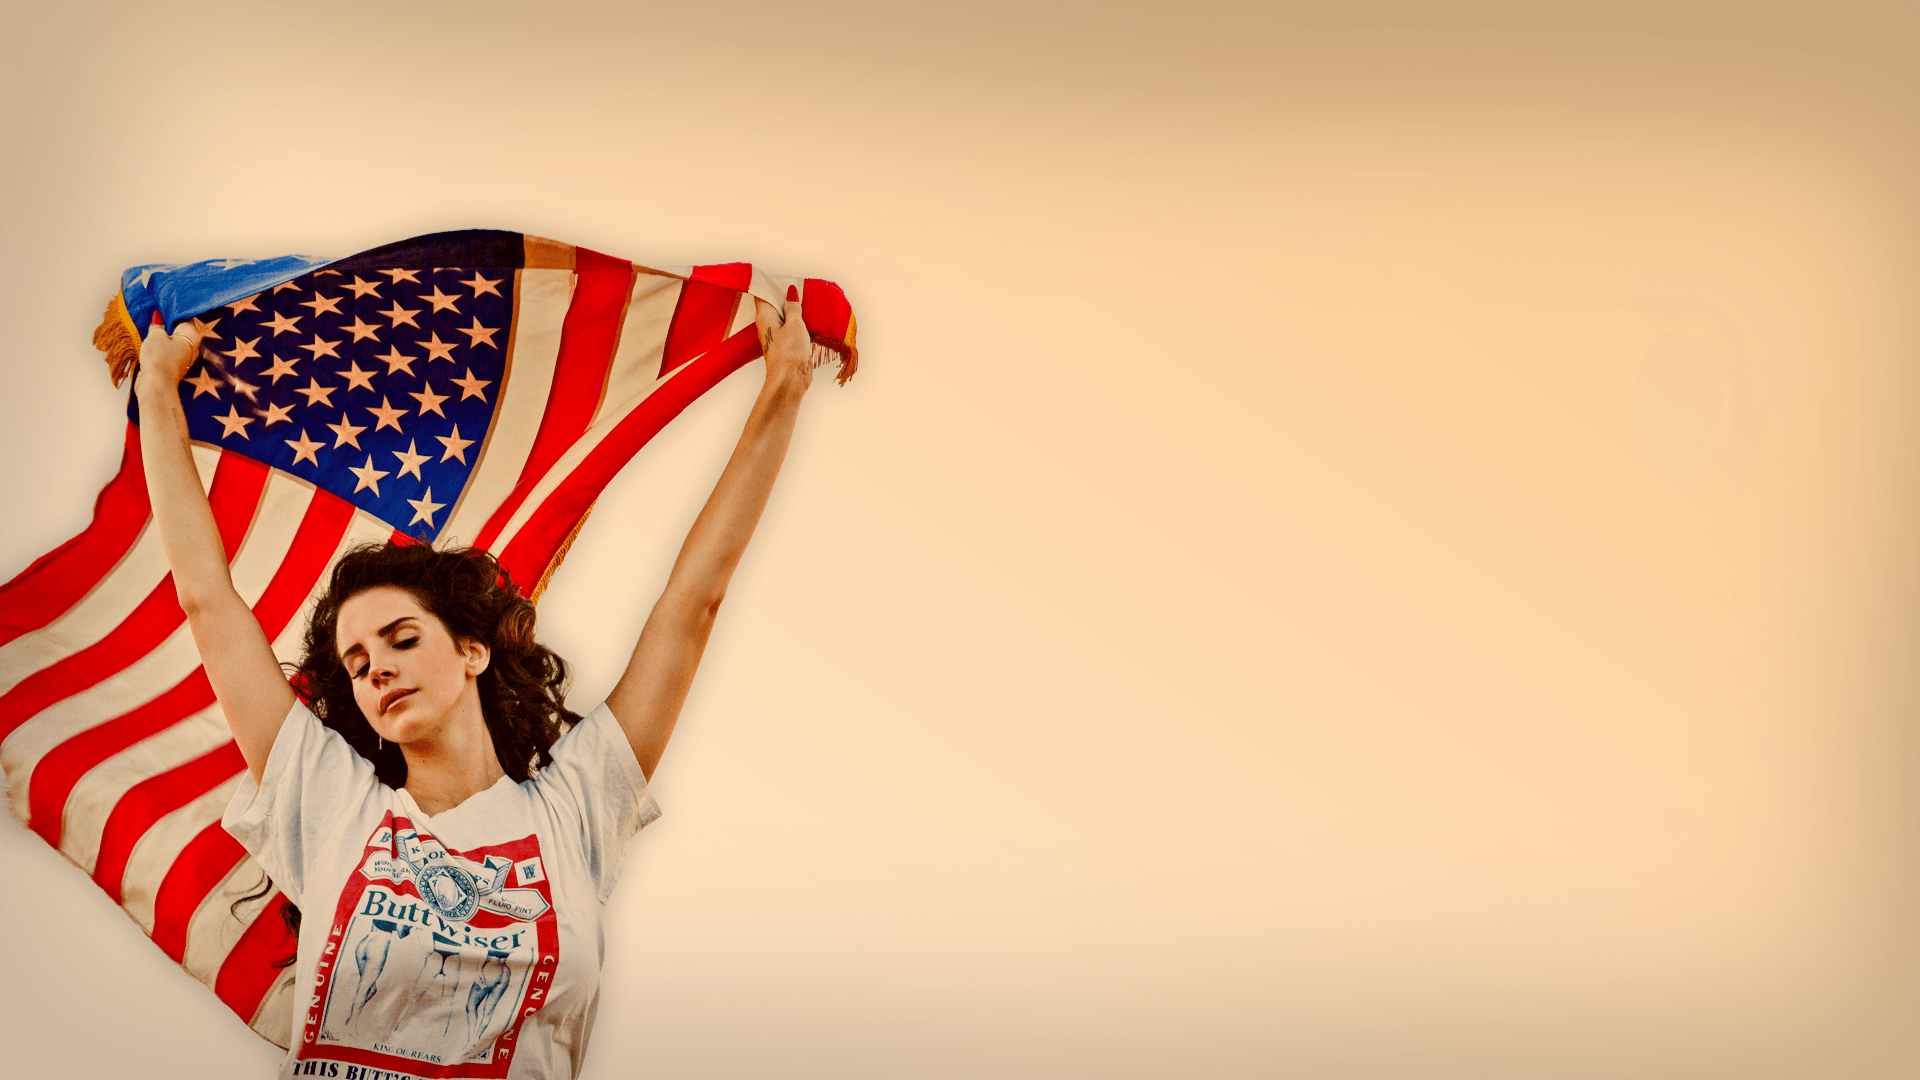 Lana Del Rey Wallpaper 6   1920 X 1080 stmednet 1920x1080